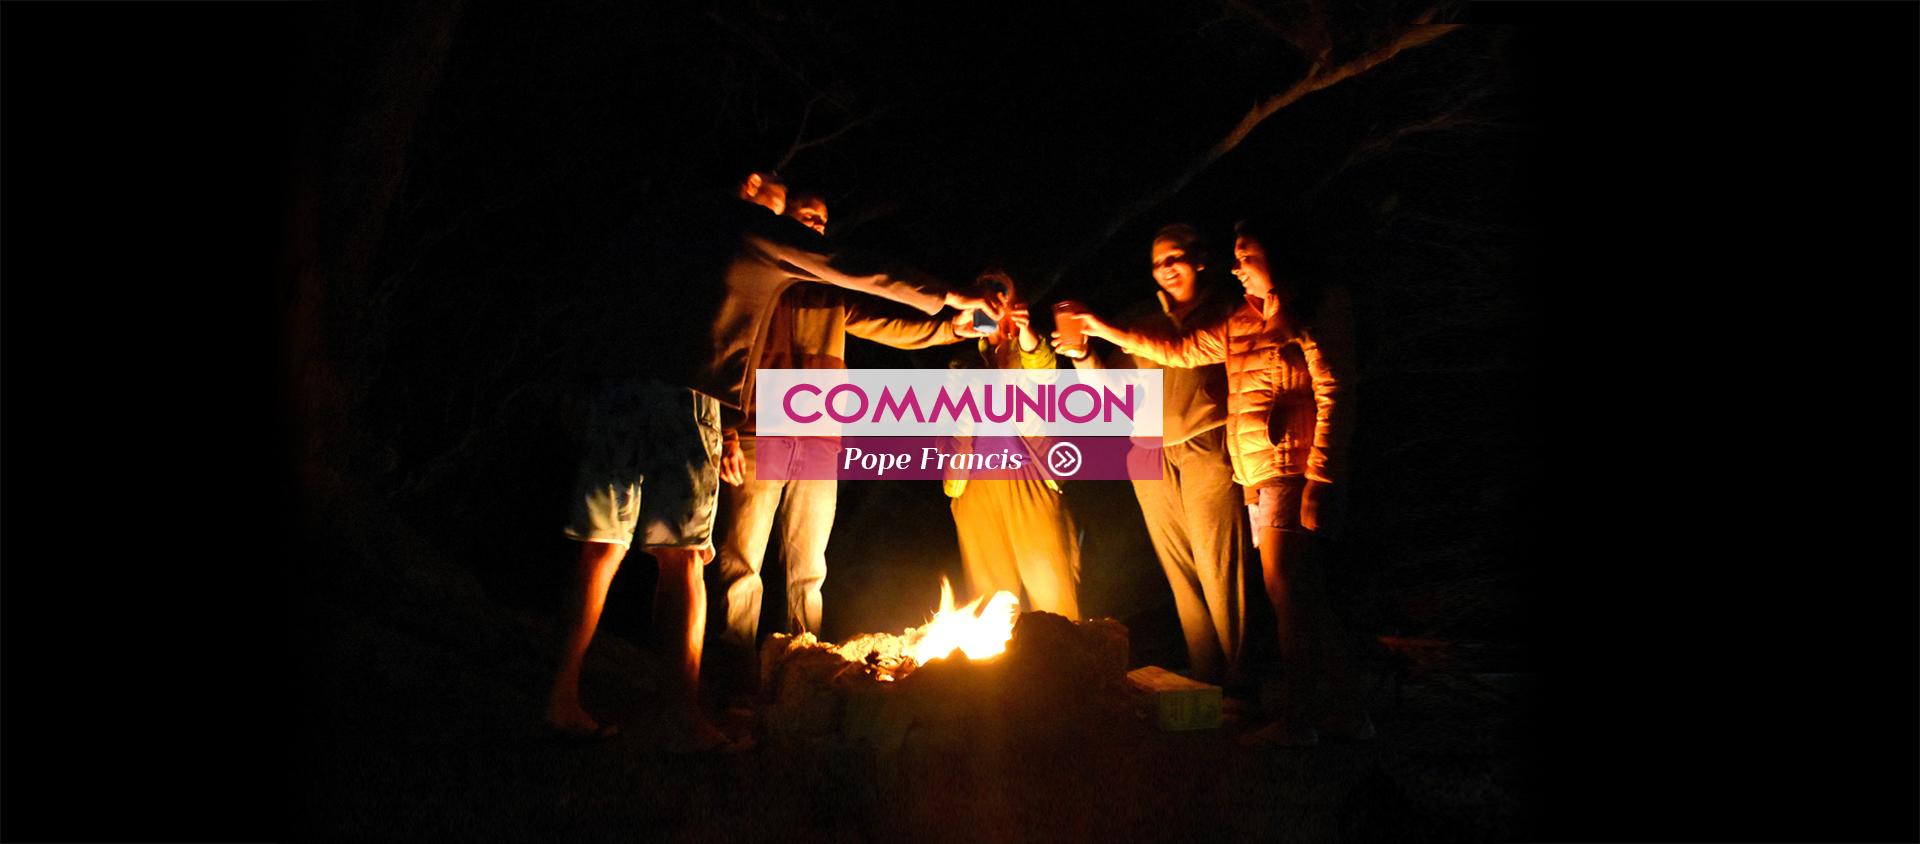 ommunion